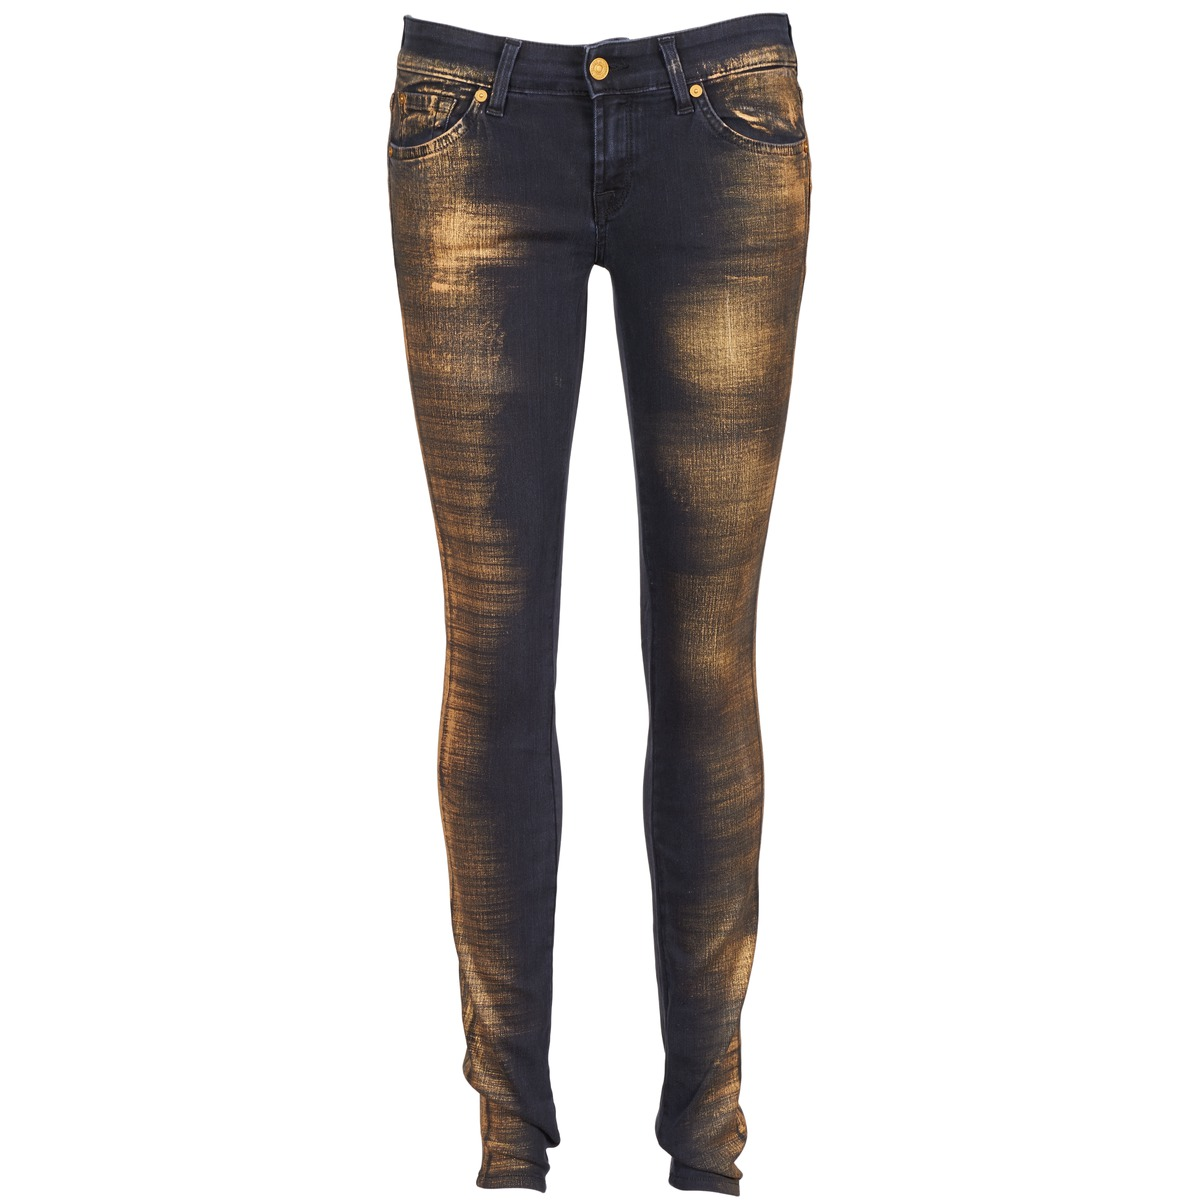 7 for all mankind  olivya  women's skinny jeans in blue